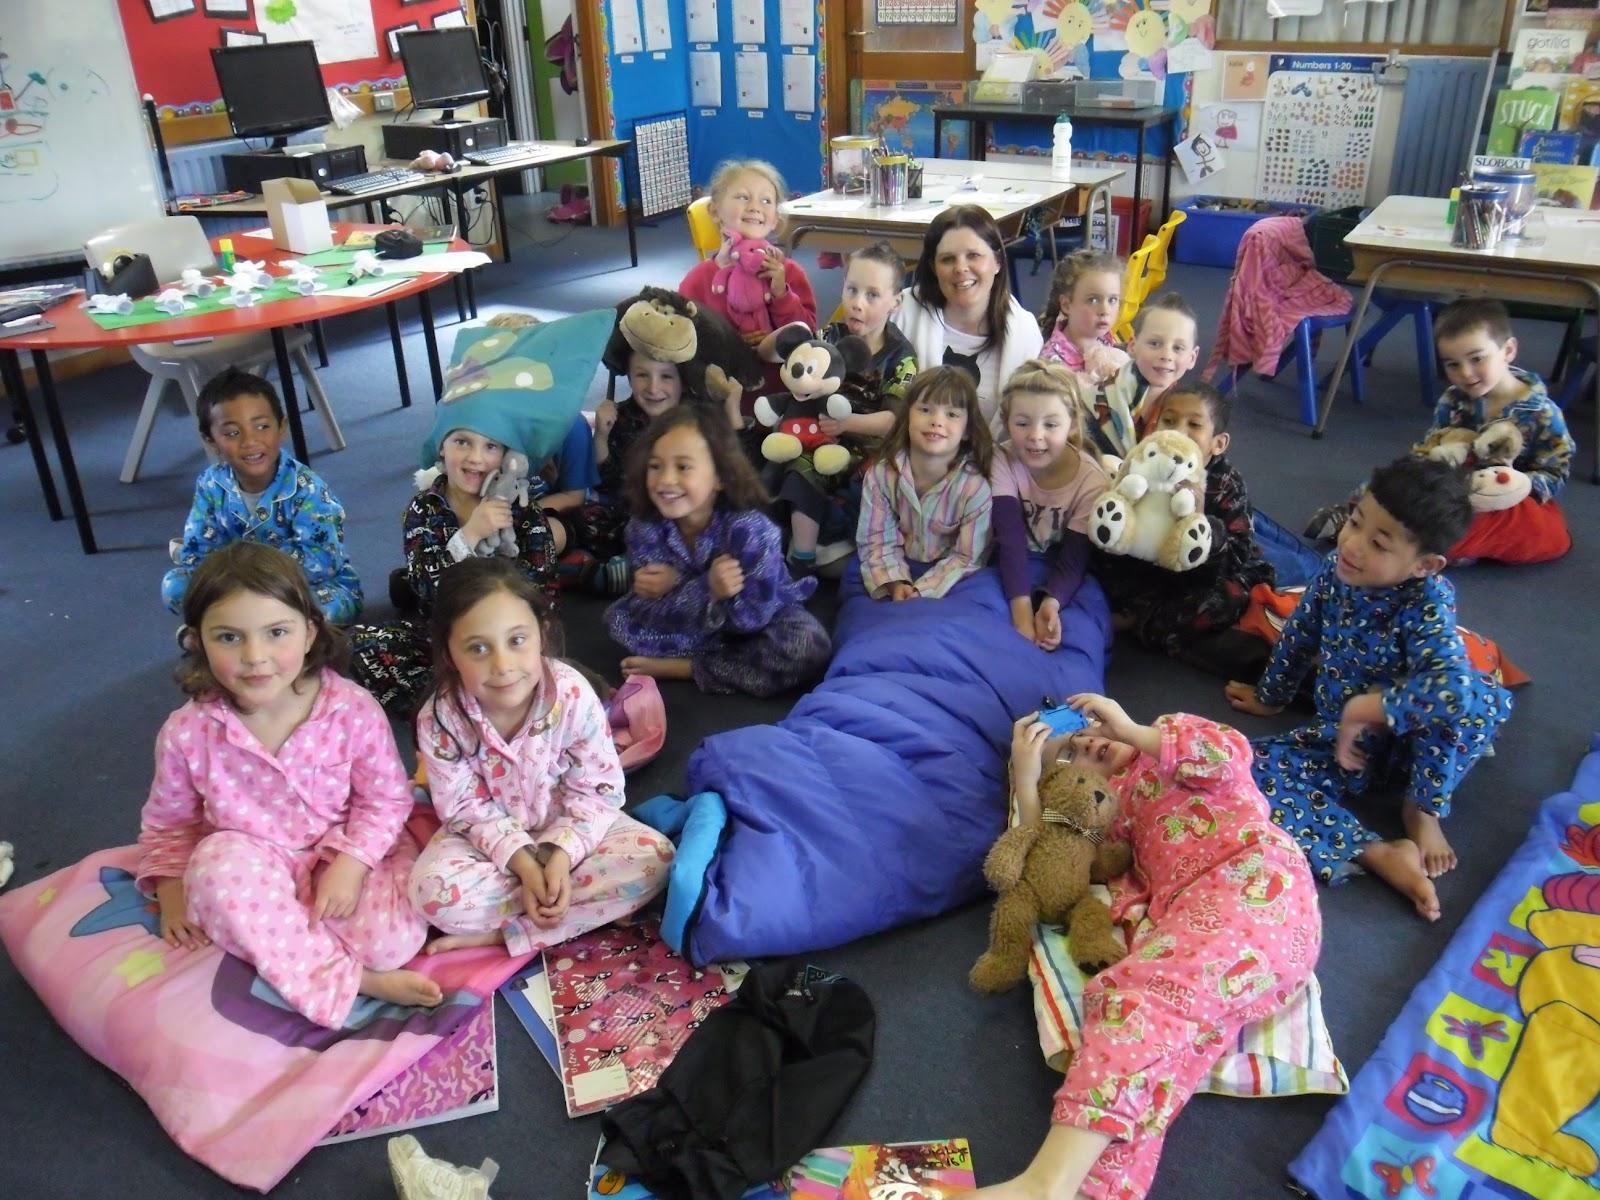 Room 8 Ens Pajama Day